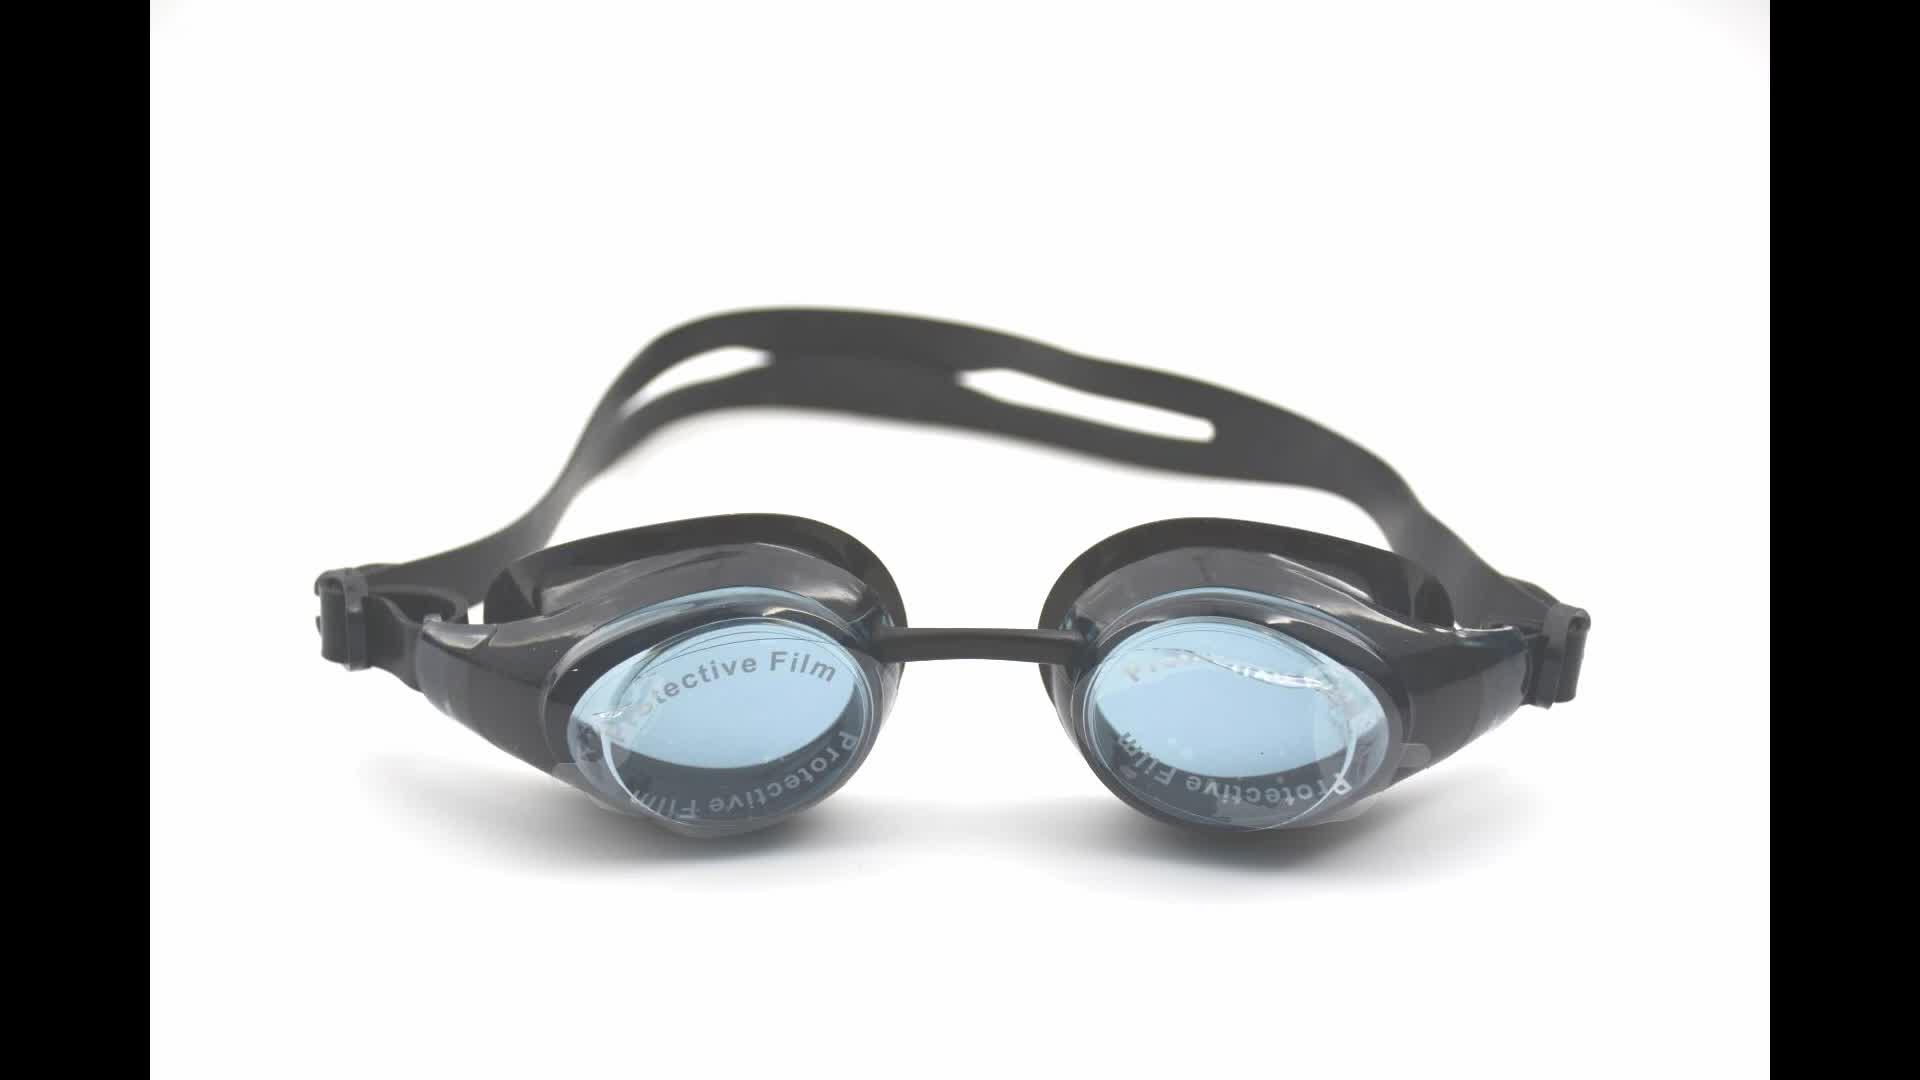 Fashionable anti fog swim goggle strap for pc lenses